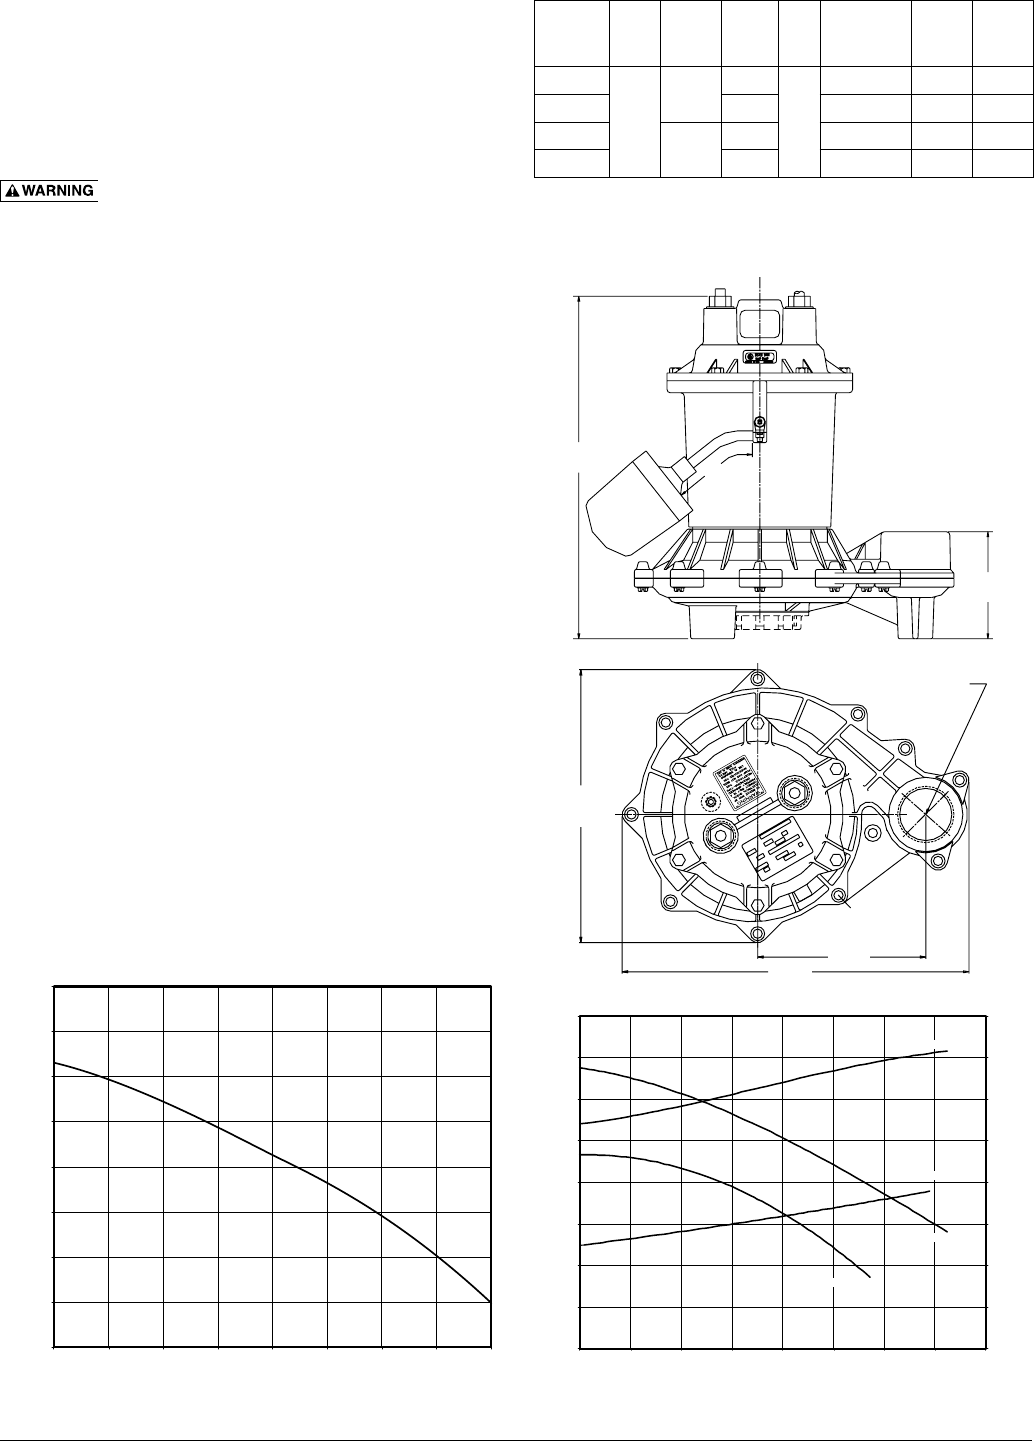 3 Myers Me40 Manual User